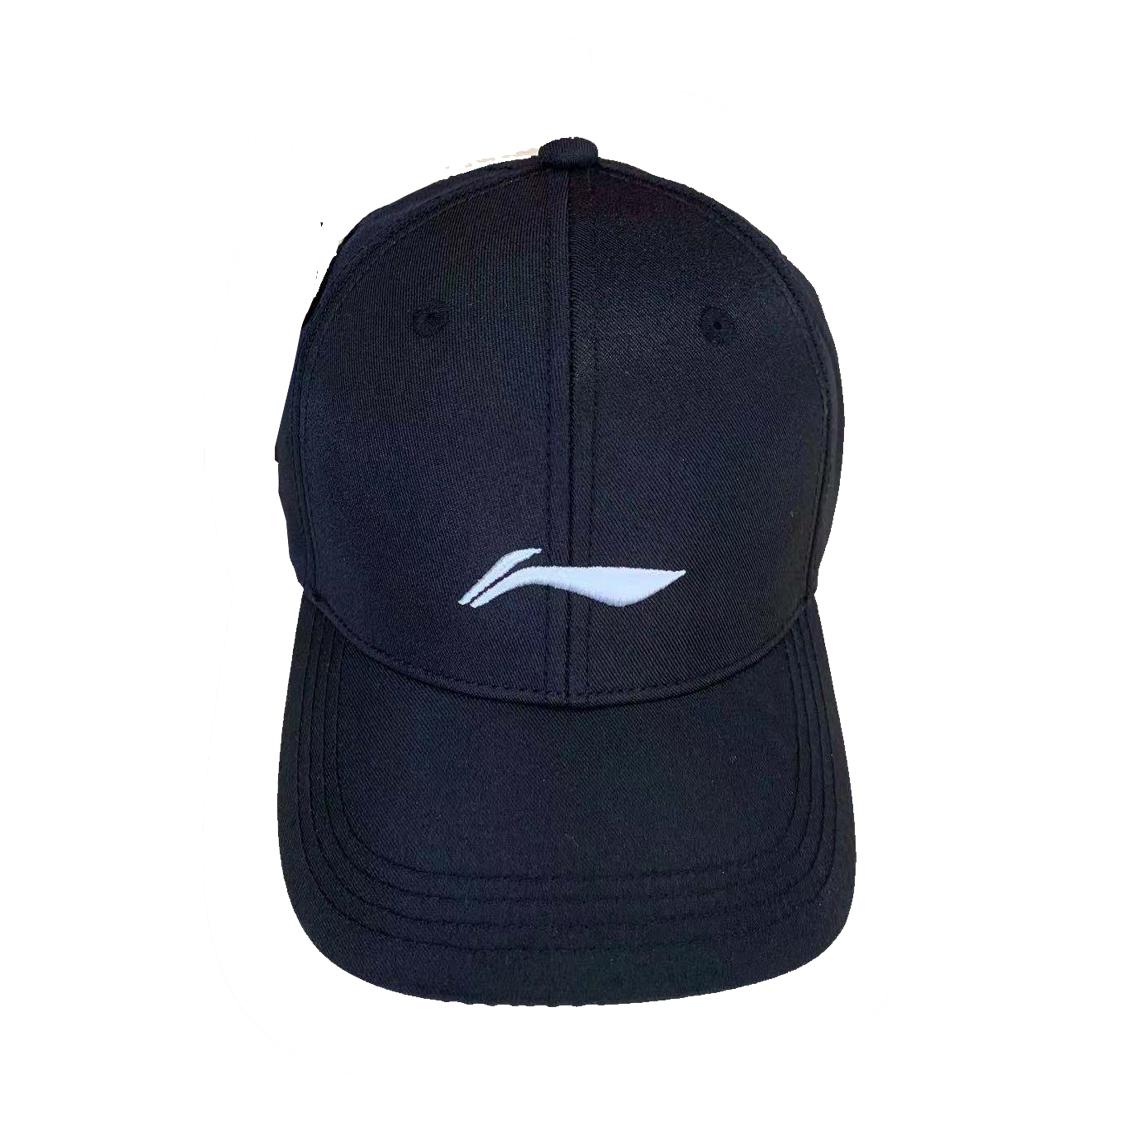 LI-NING 李宁 团购系列 棒球帽 黑色 AMYR362-1